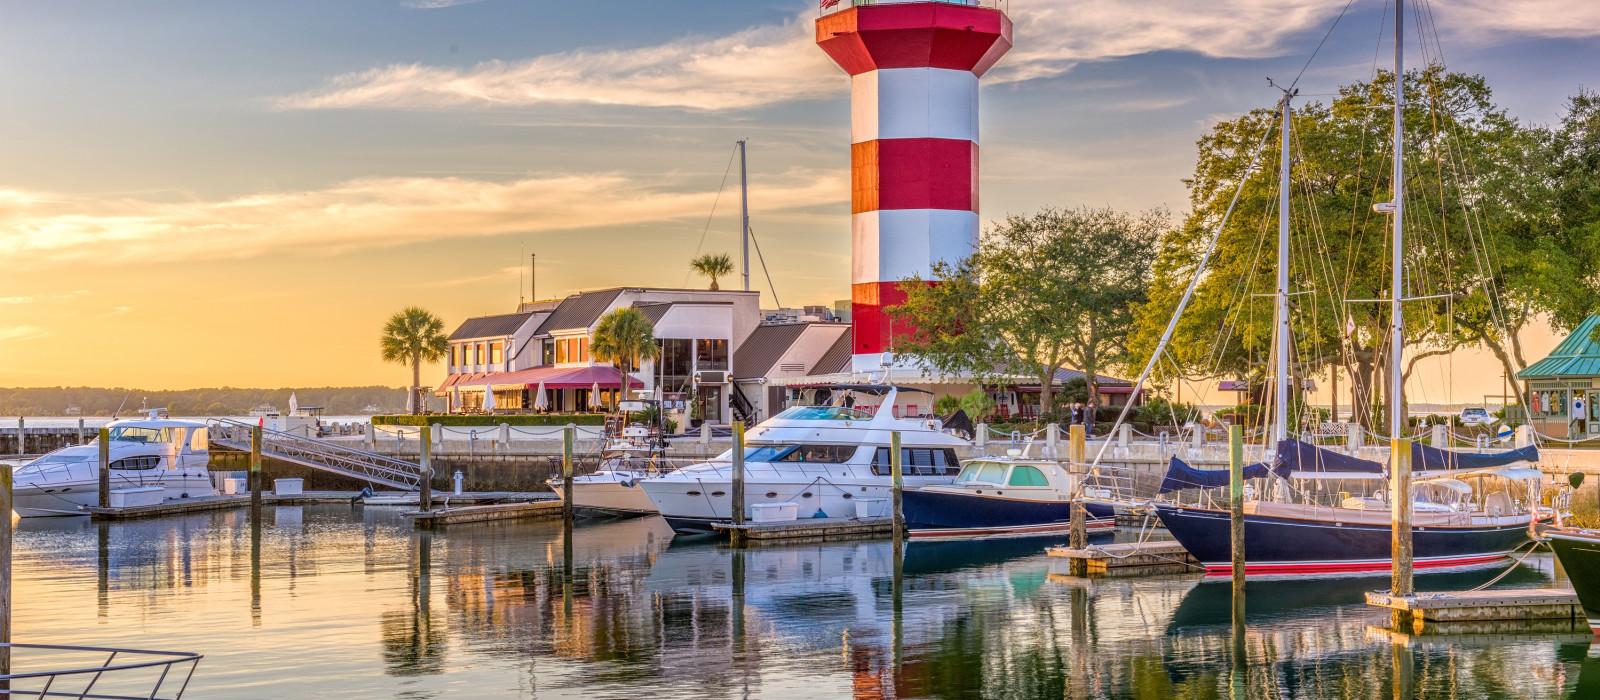 Destination Hilton Head Island USA